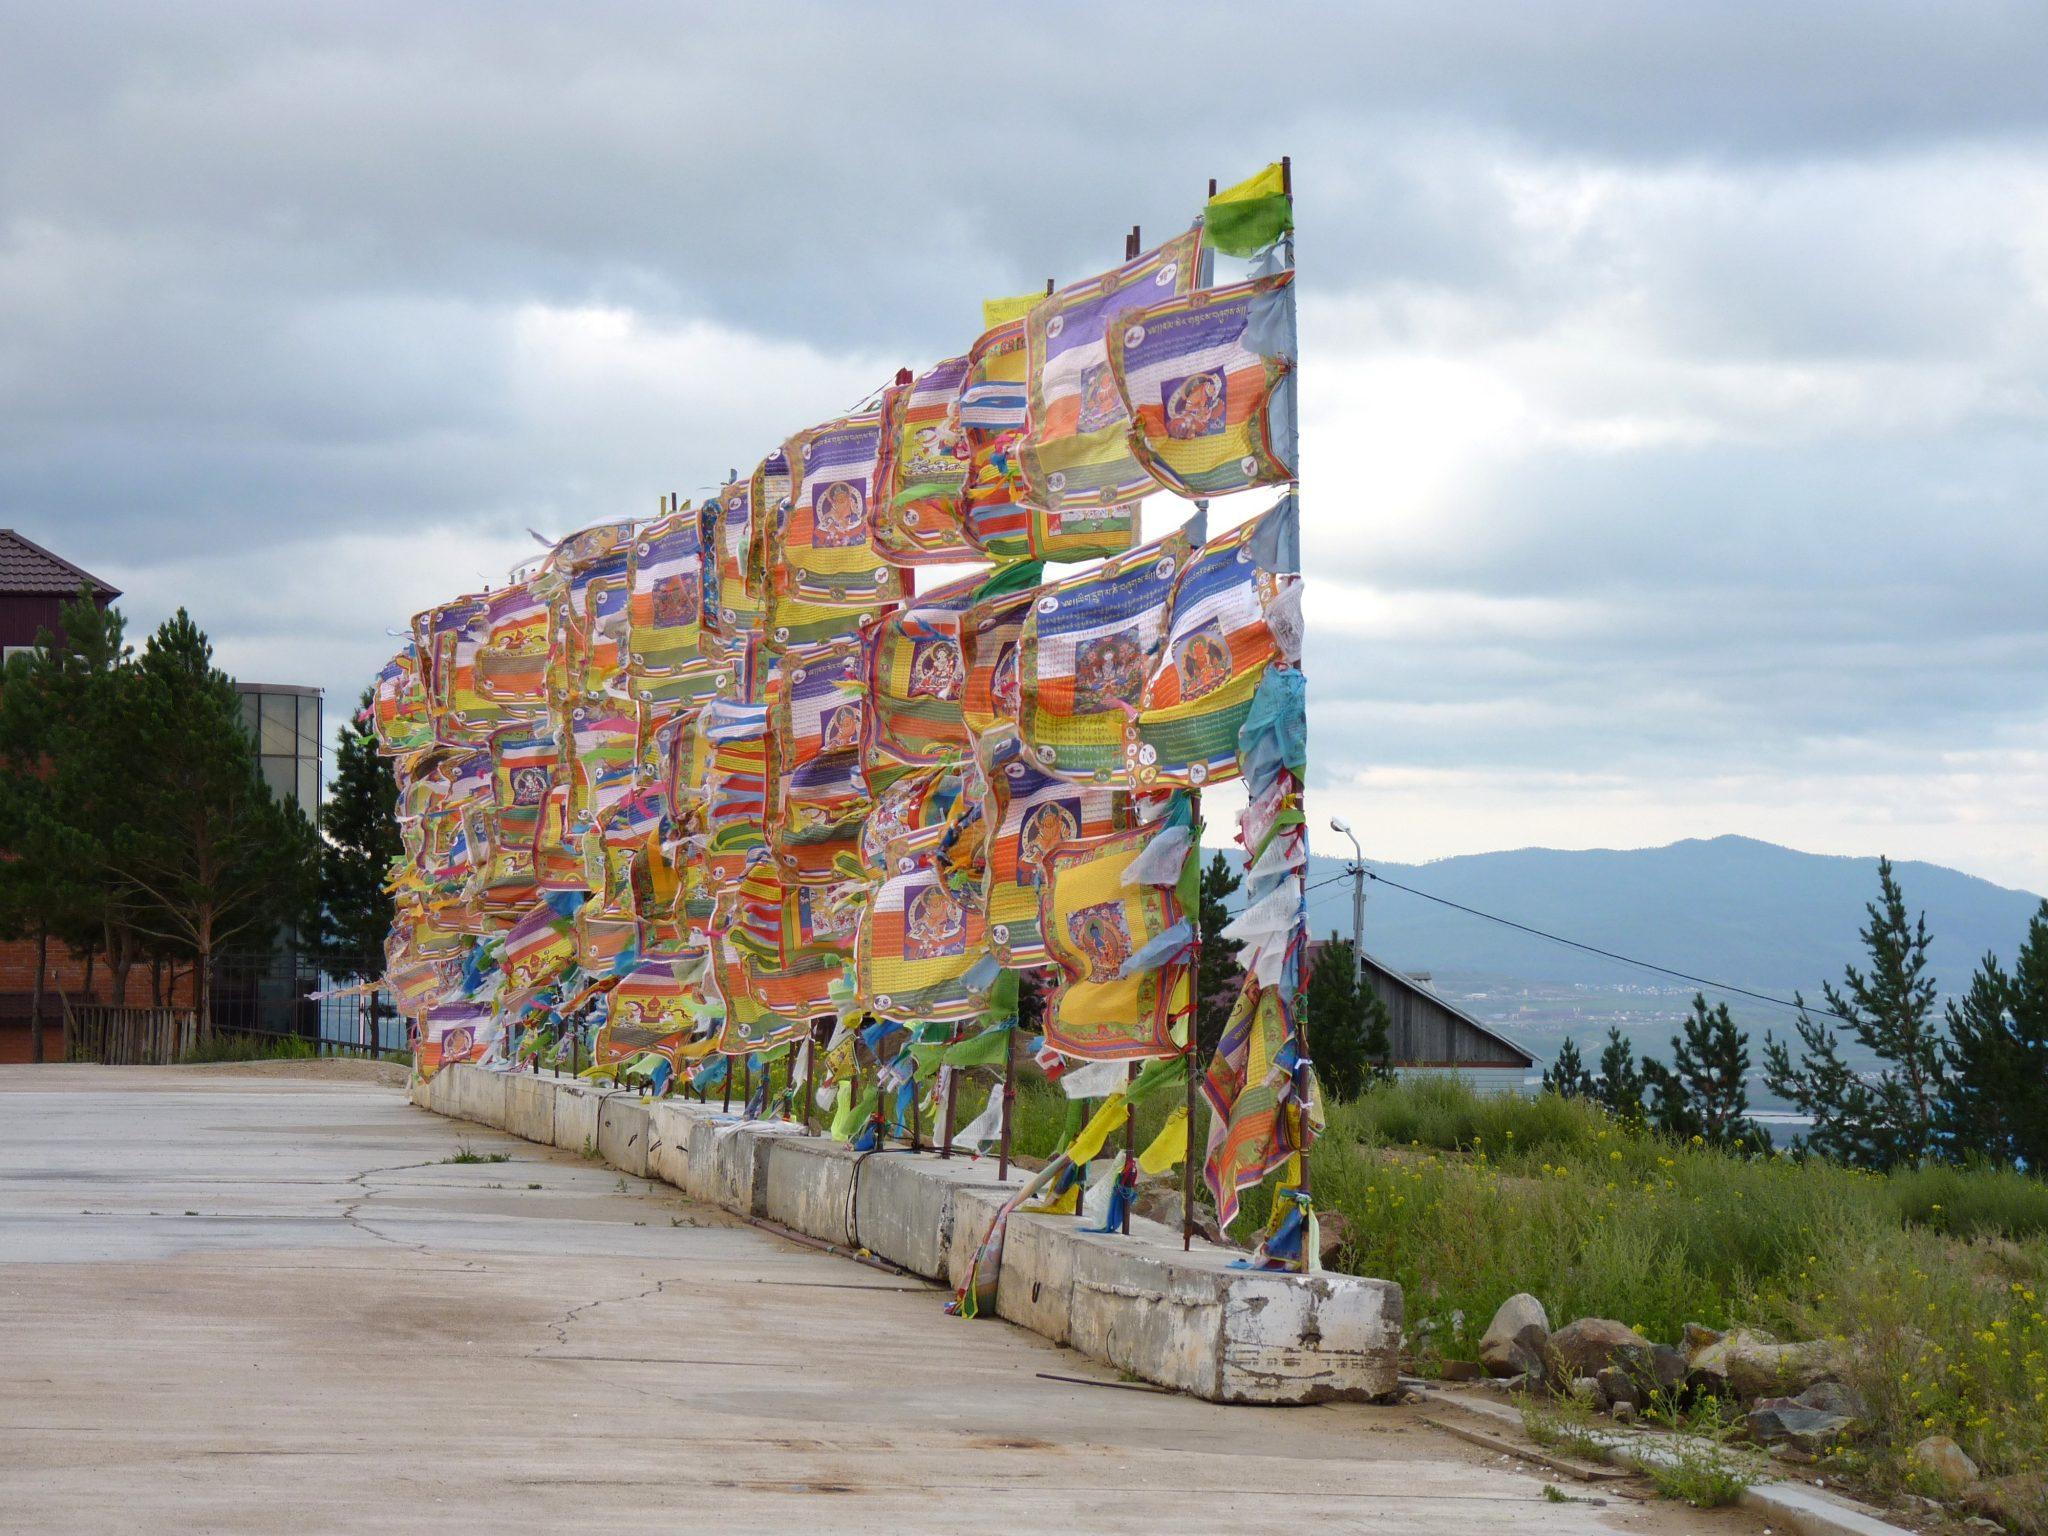 Rinpoche Bagsha 09 Ulan-Ude Rússia Mundo Indefinido